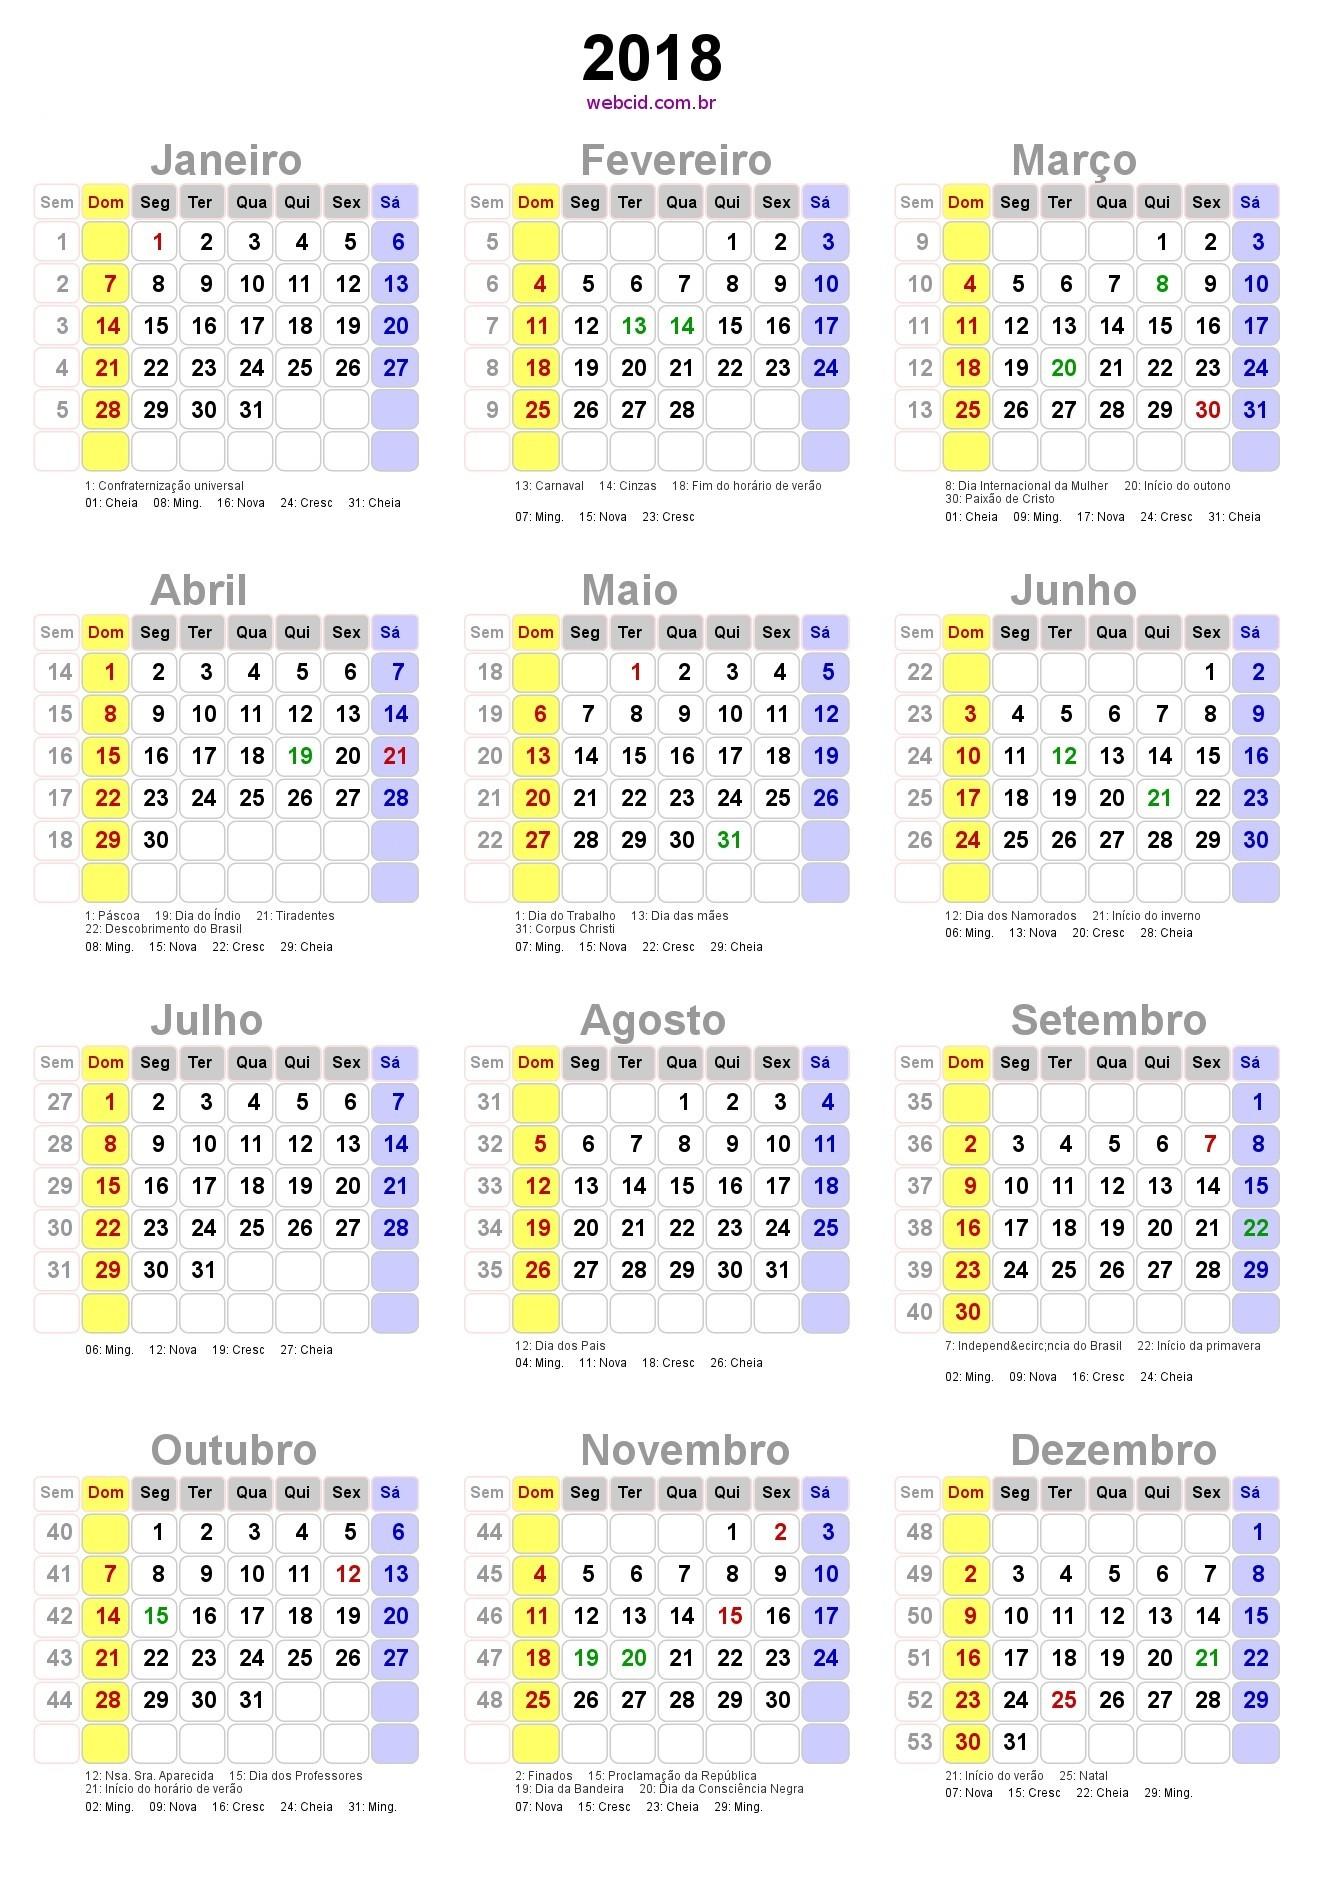 Calendario 2017 Com Lua E Feriados Para Imprimir Más Caliente Evaluar Calendario 2019 Con Sus Feriados Of Calendario 2017 Com Lua E Feriados Para Imprimir Más Populares atividades Diarias Realidade Suspensa organiza§£o Pinterest